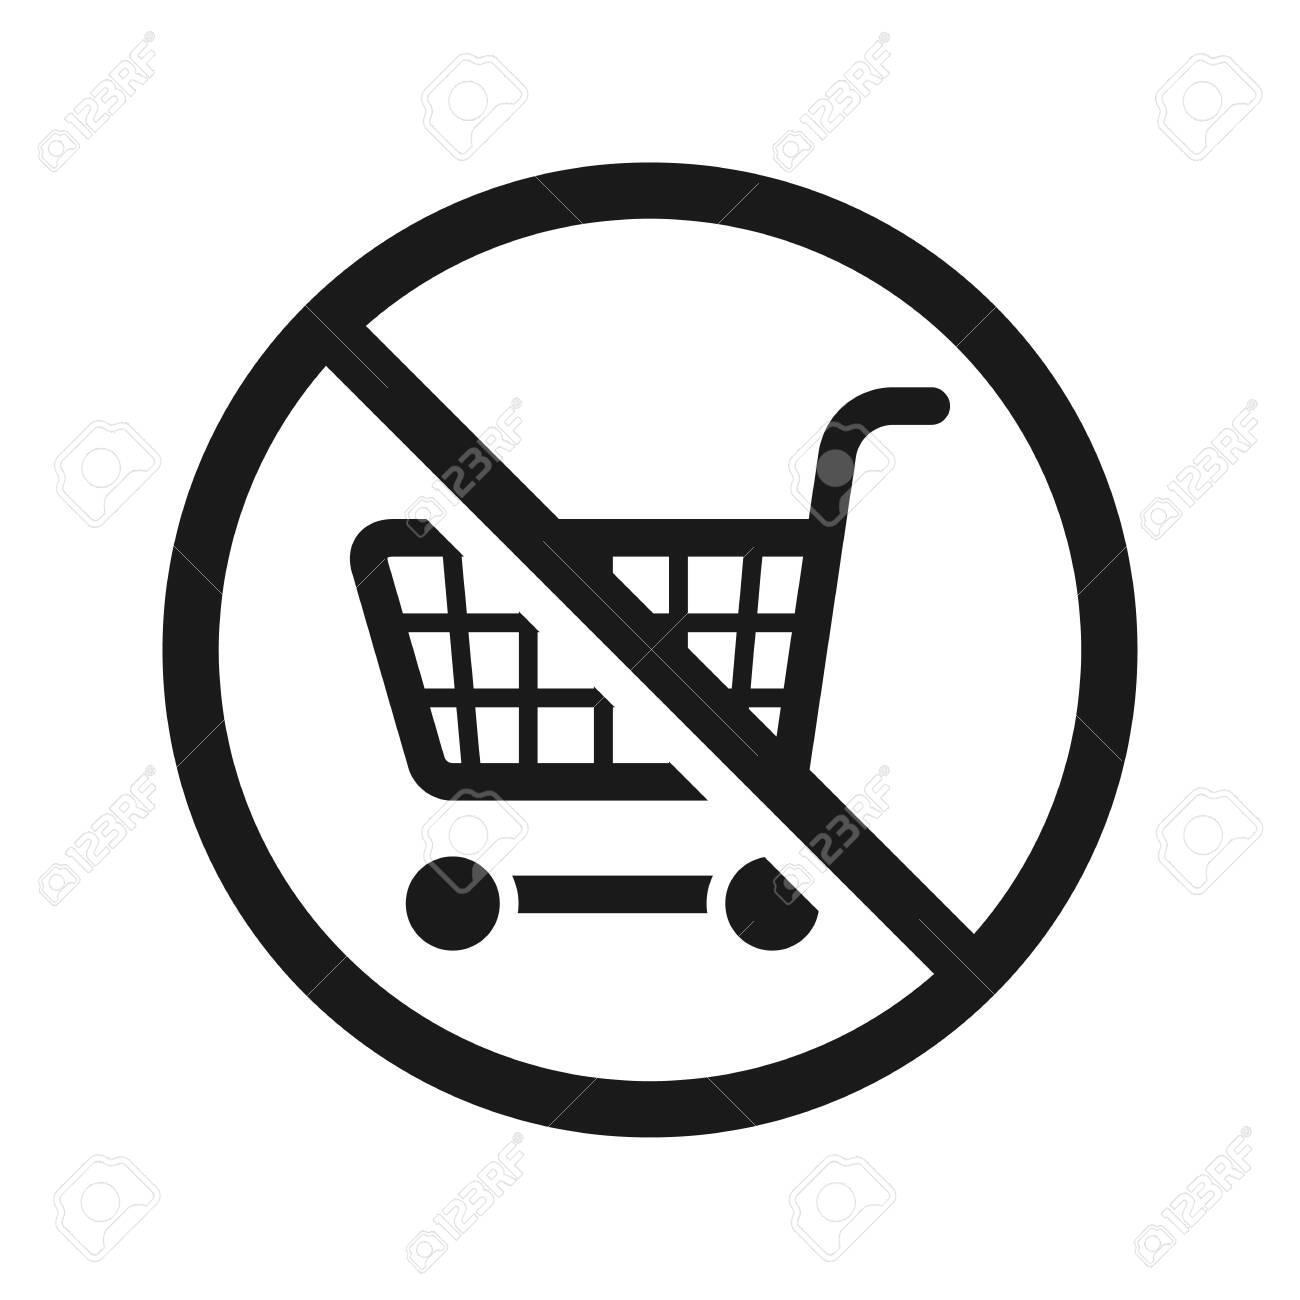 No shopping cart sign, vector illustration - 147601500